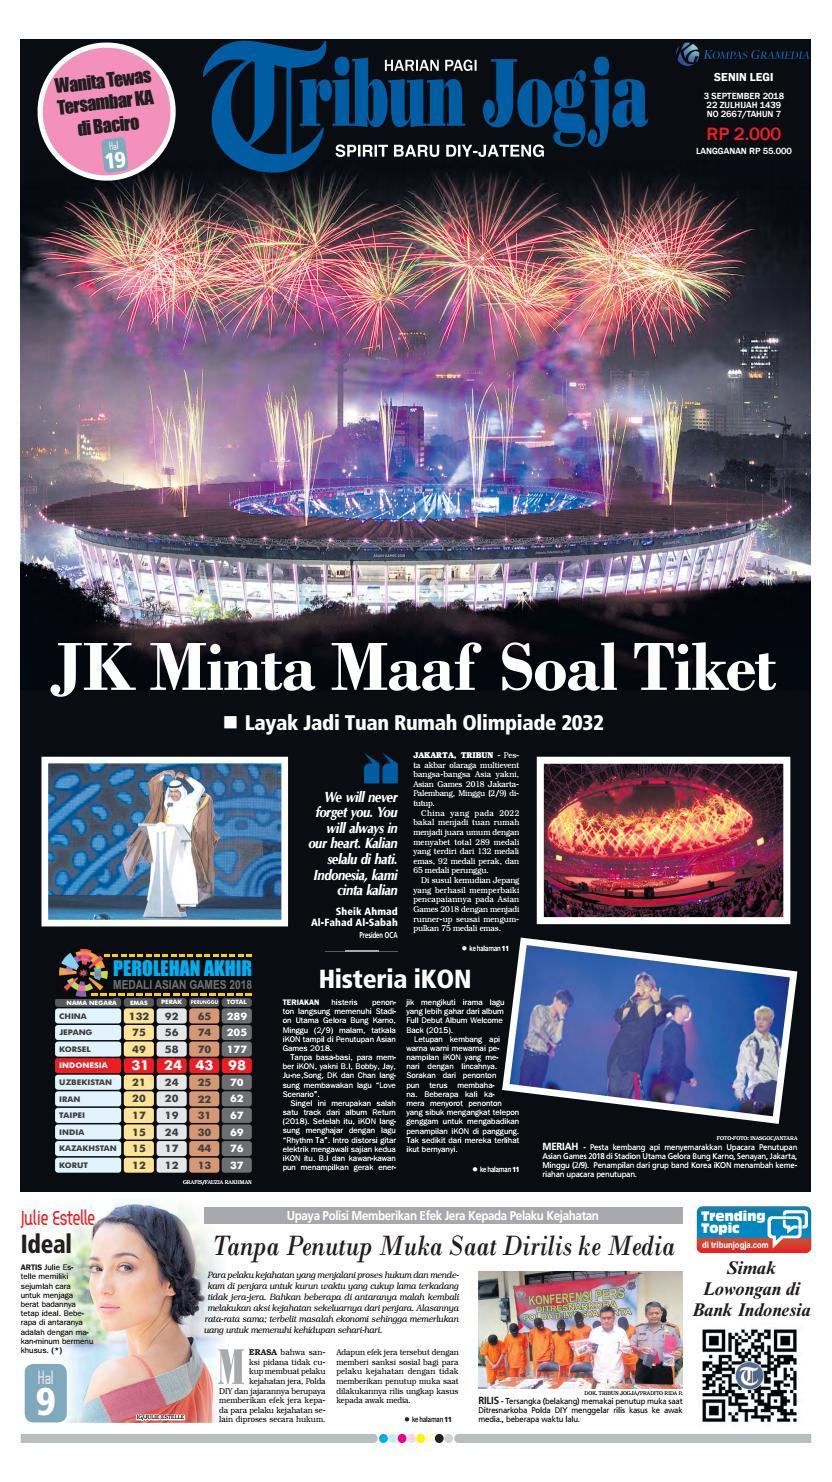 Tribun Jogja 03 09 2018 By Issuu Produk Ukm Bumn Wisata Mewah Bali 3hr 2mlm